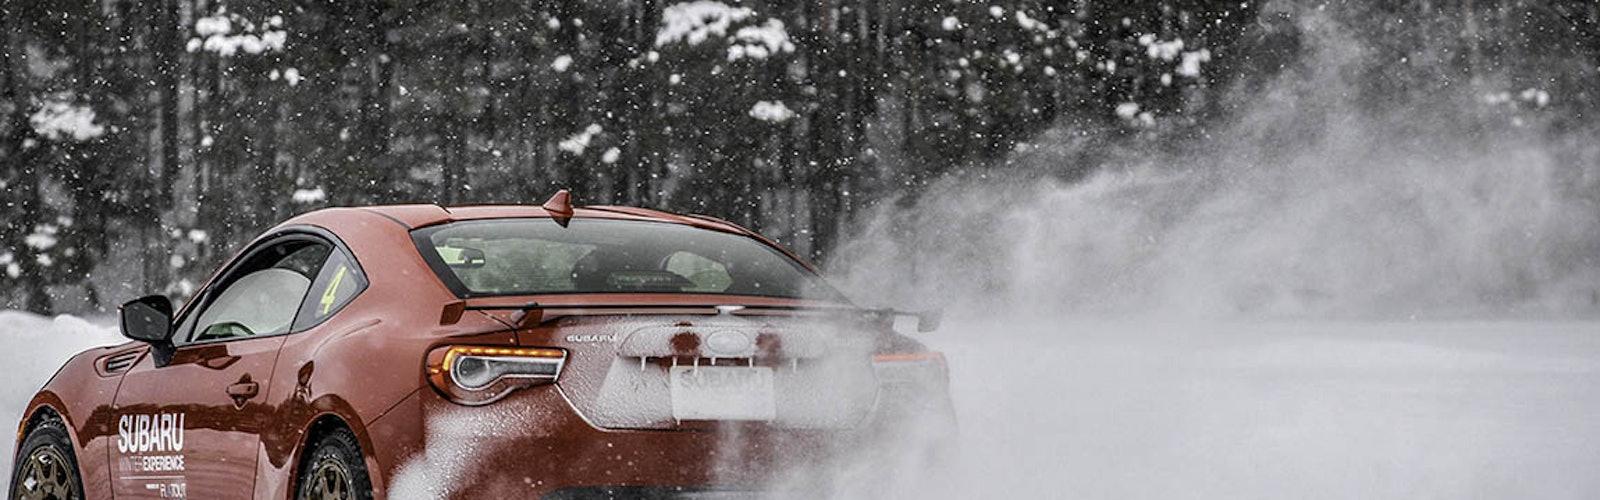 snow tires winter all seasons